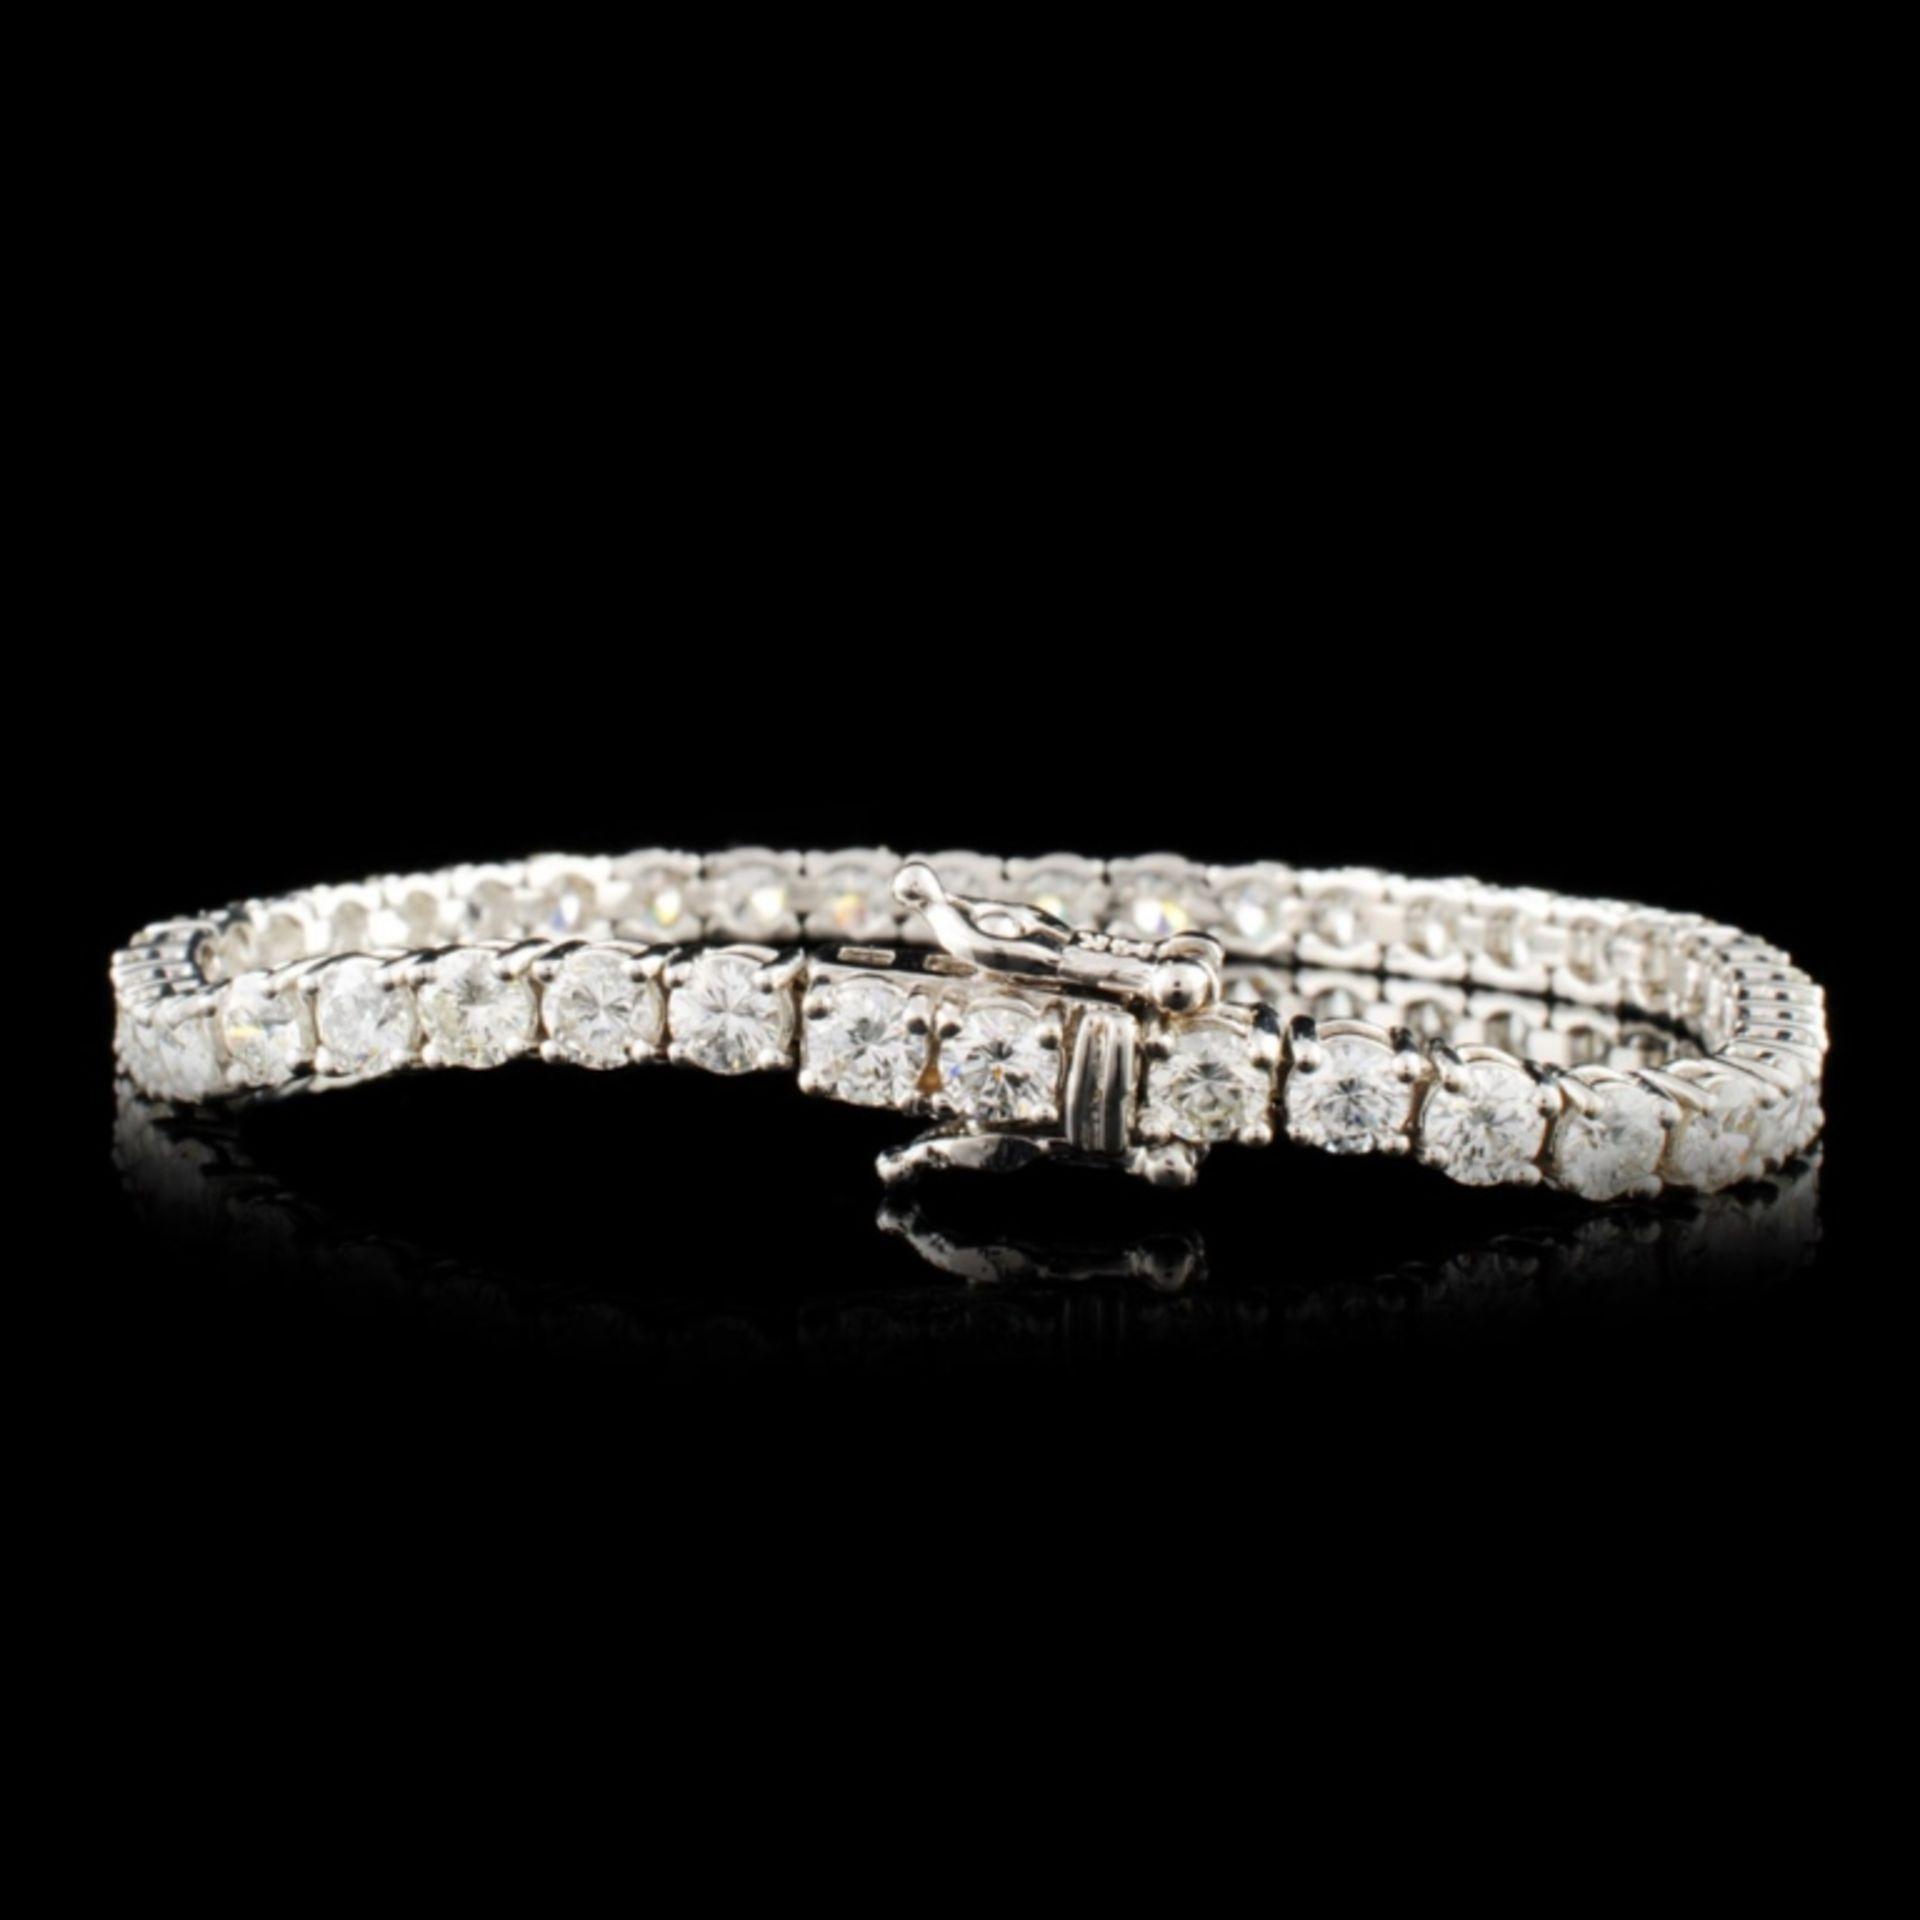 14K Gold 7.59ctw Diamond Bracelet - Image 2 of 4